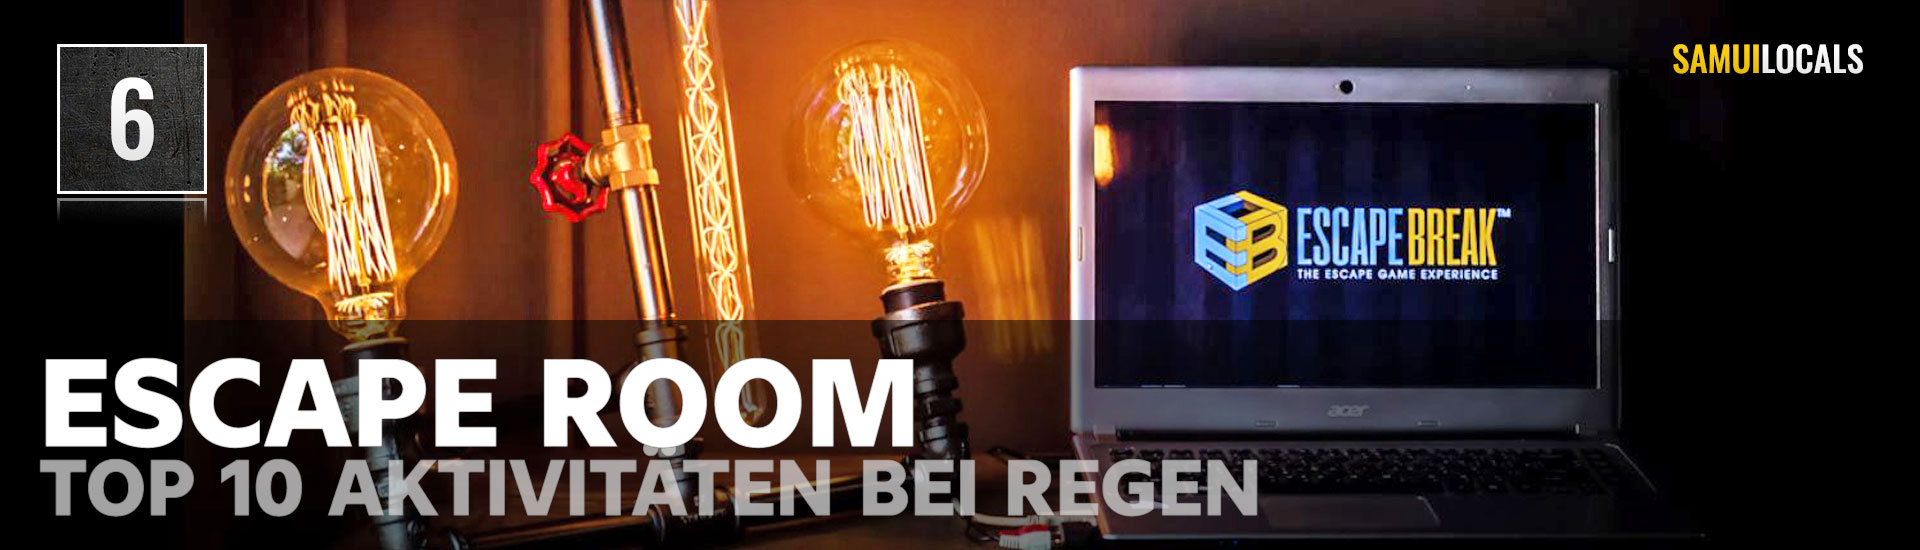 top_10_aktivitaeten_bei_regen_escape_roomjpg